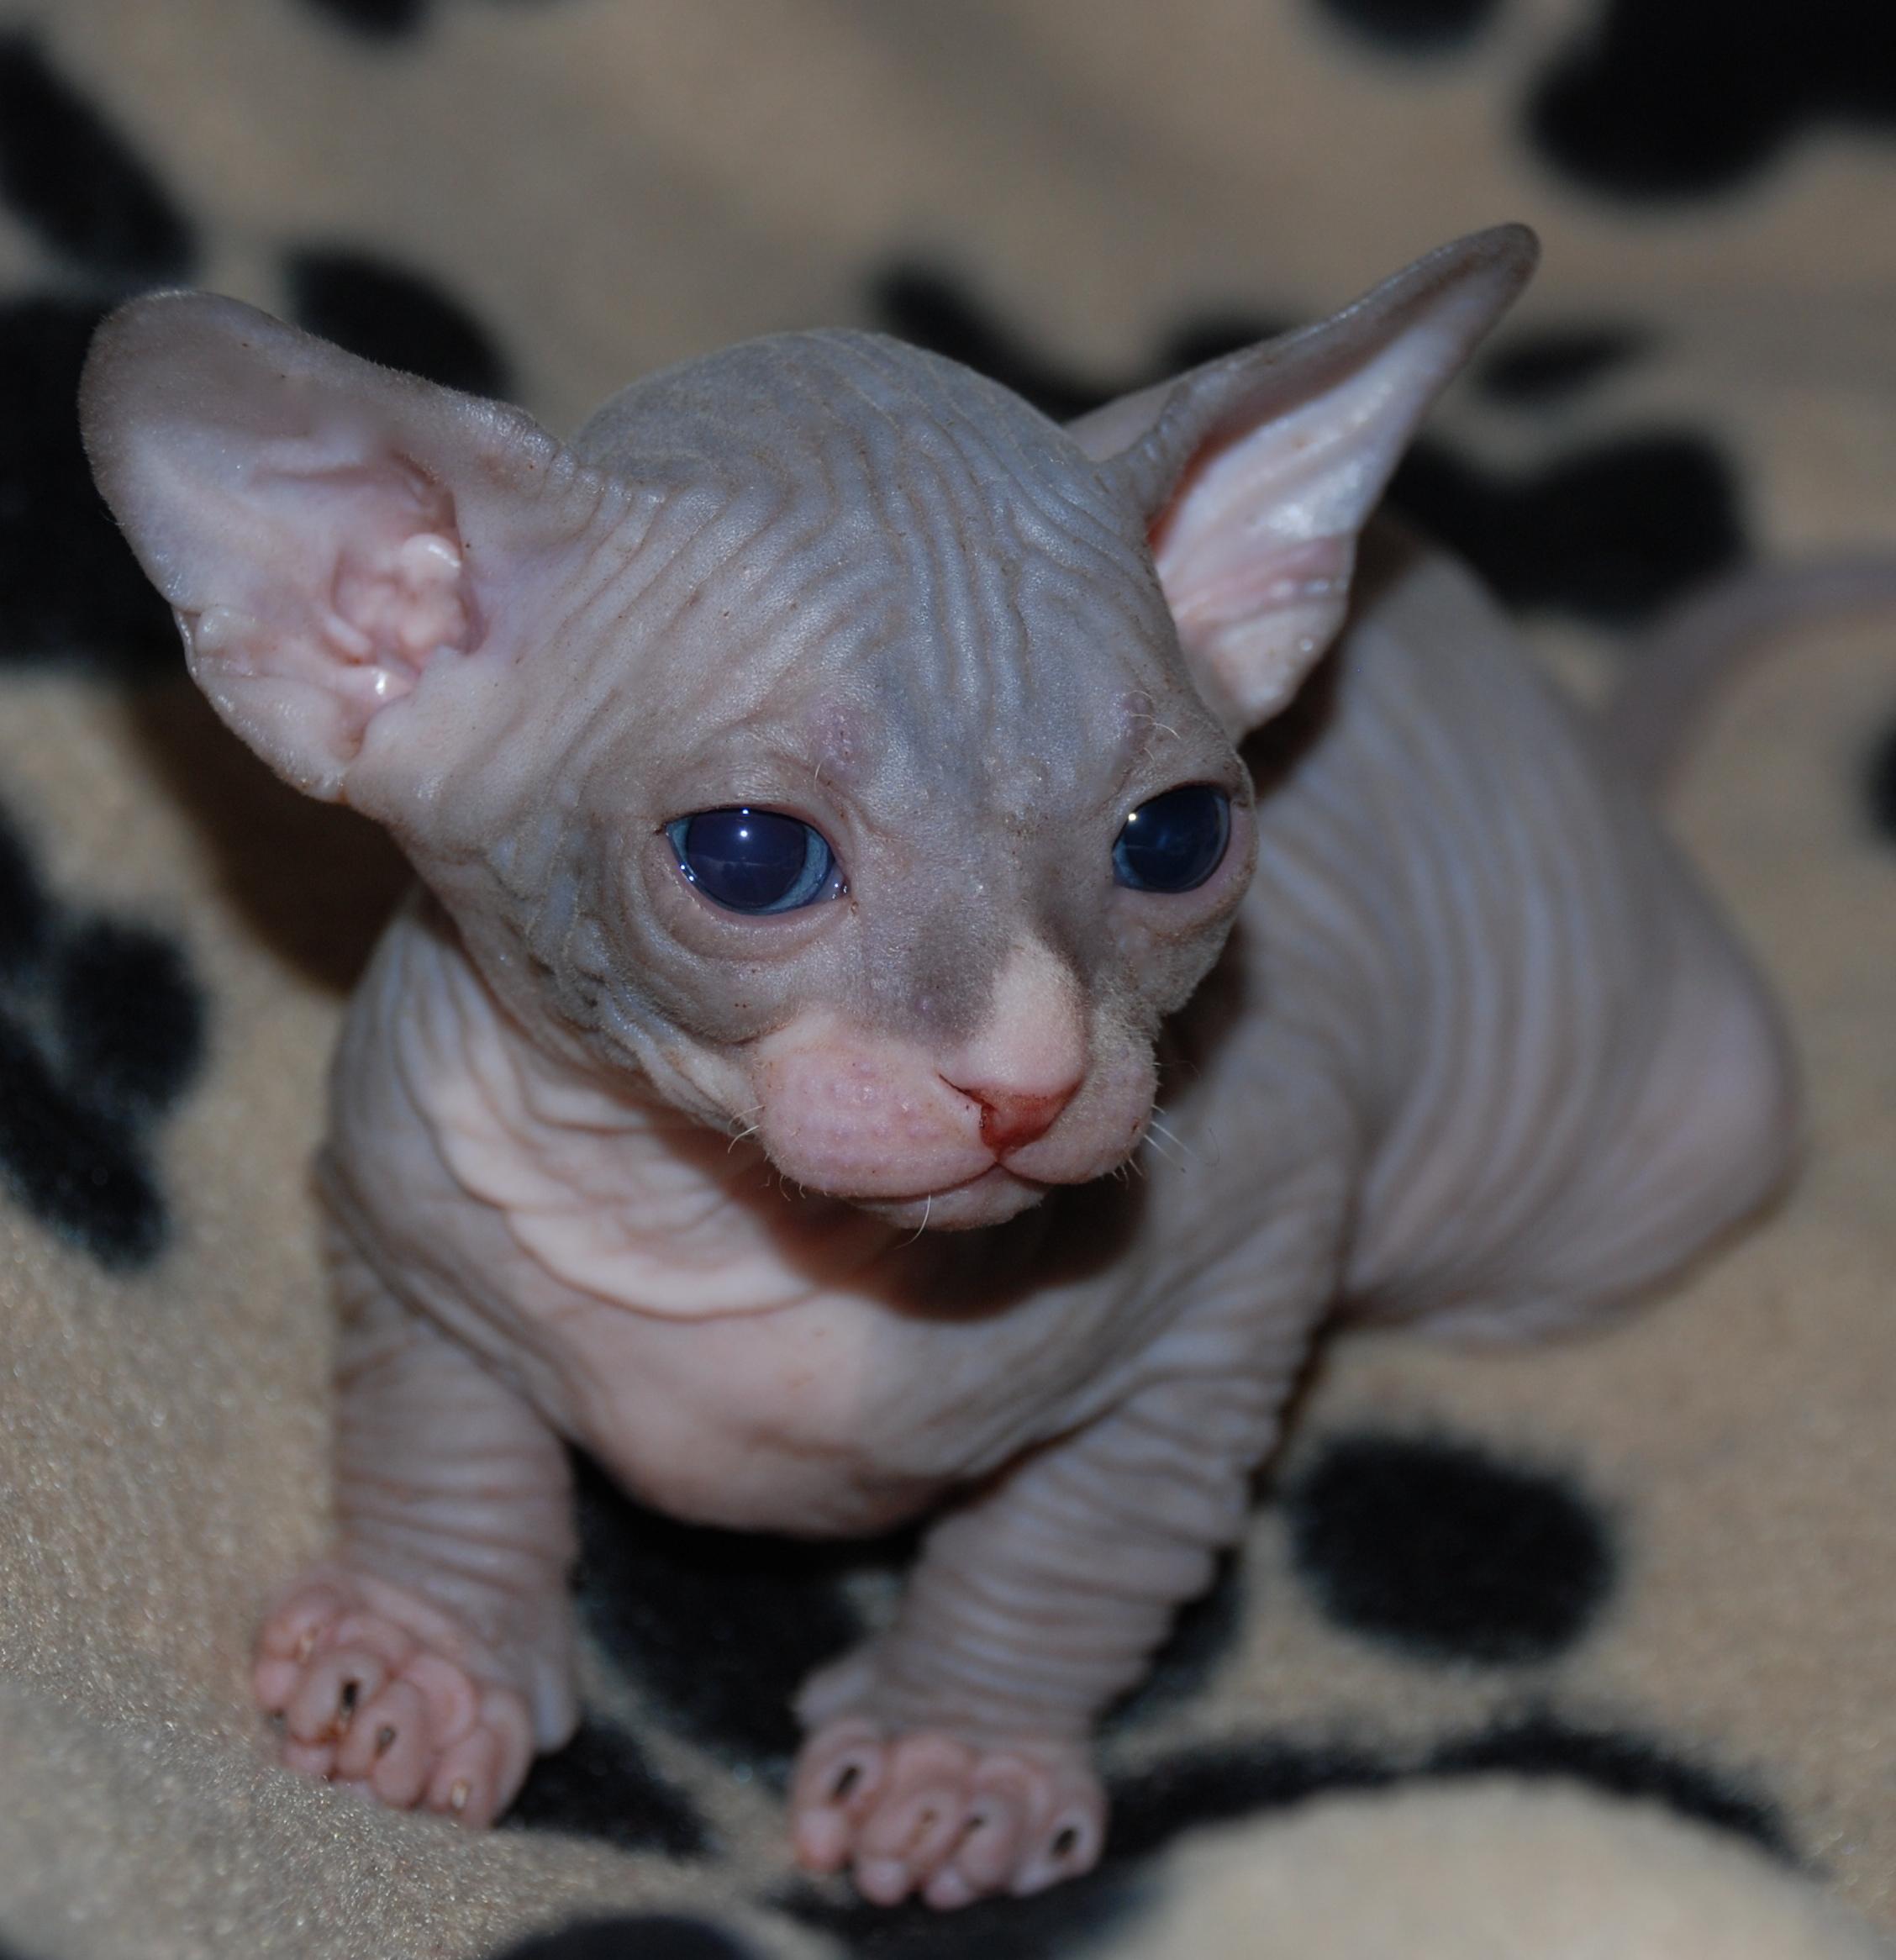 Kittens For Sale in Abertyleri (abertillery) Blaenau Gwent